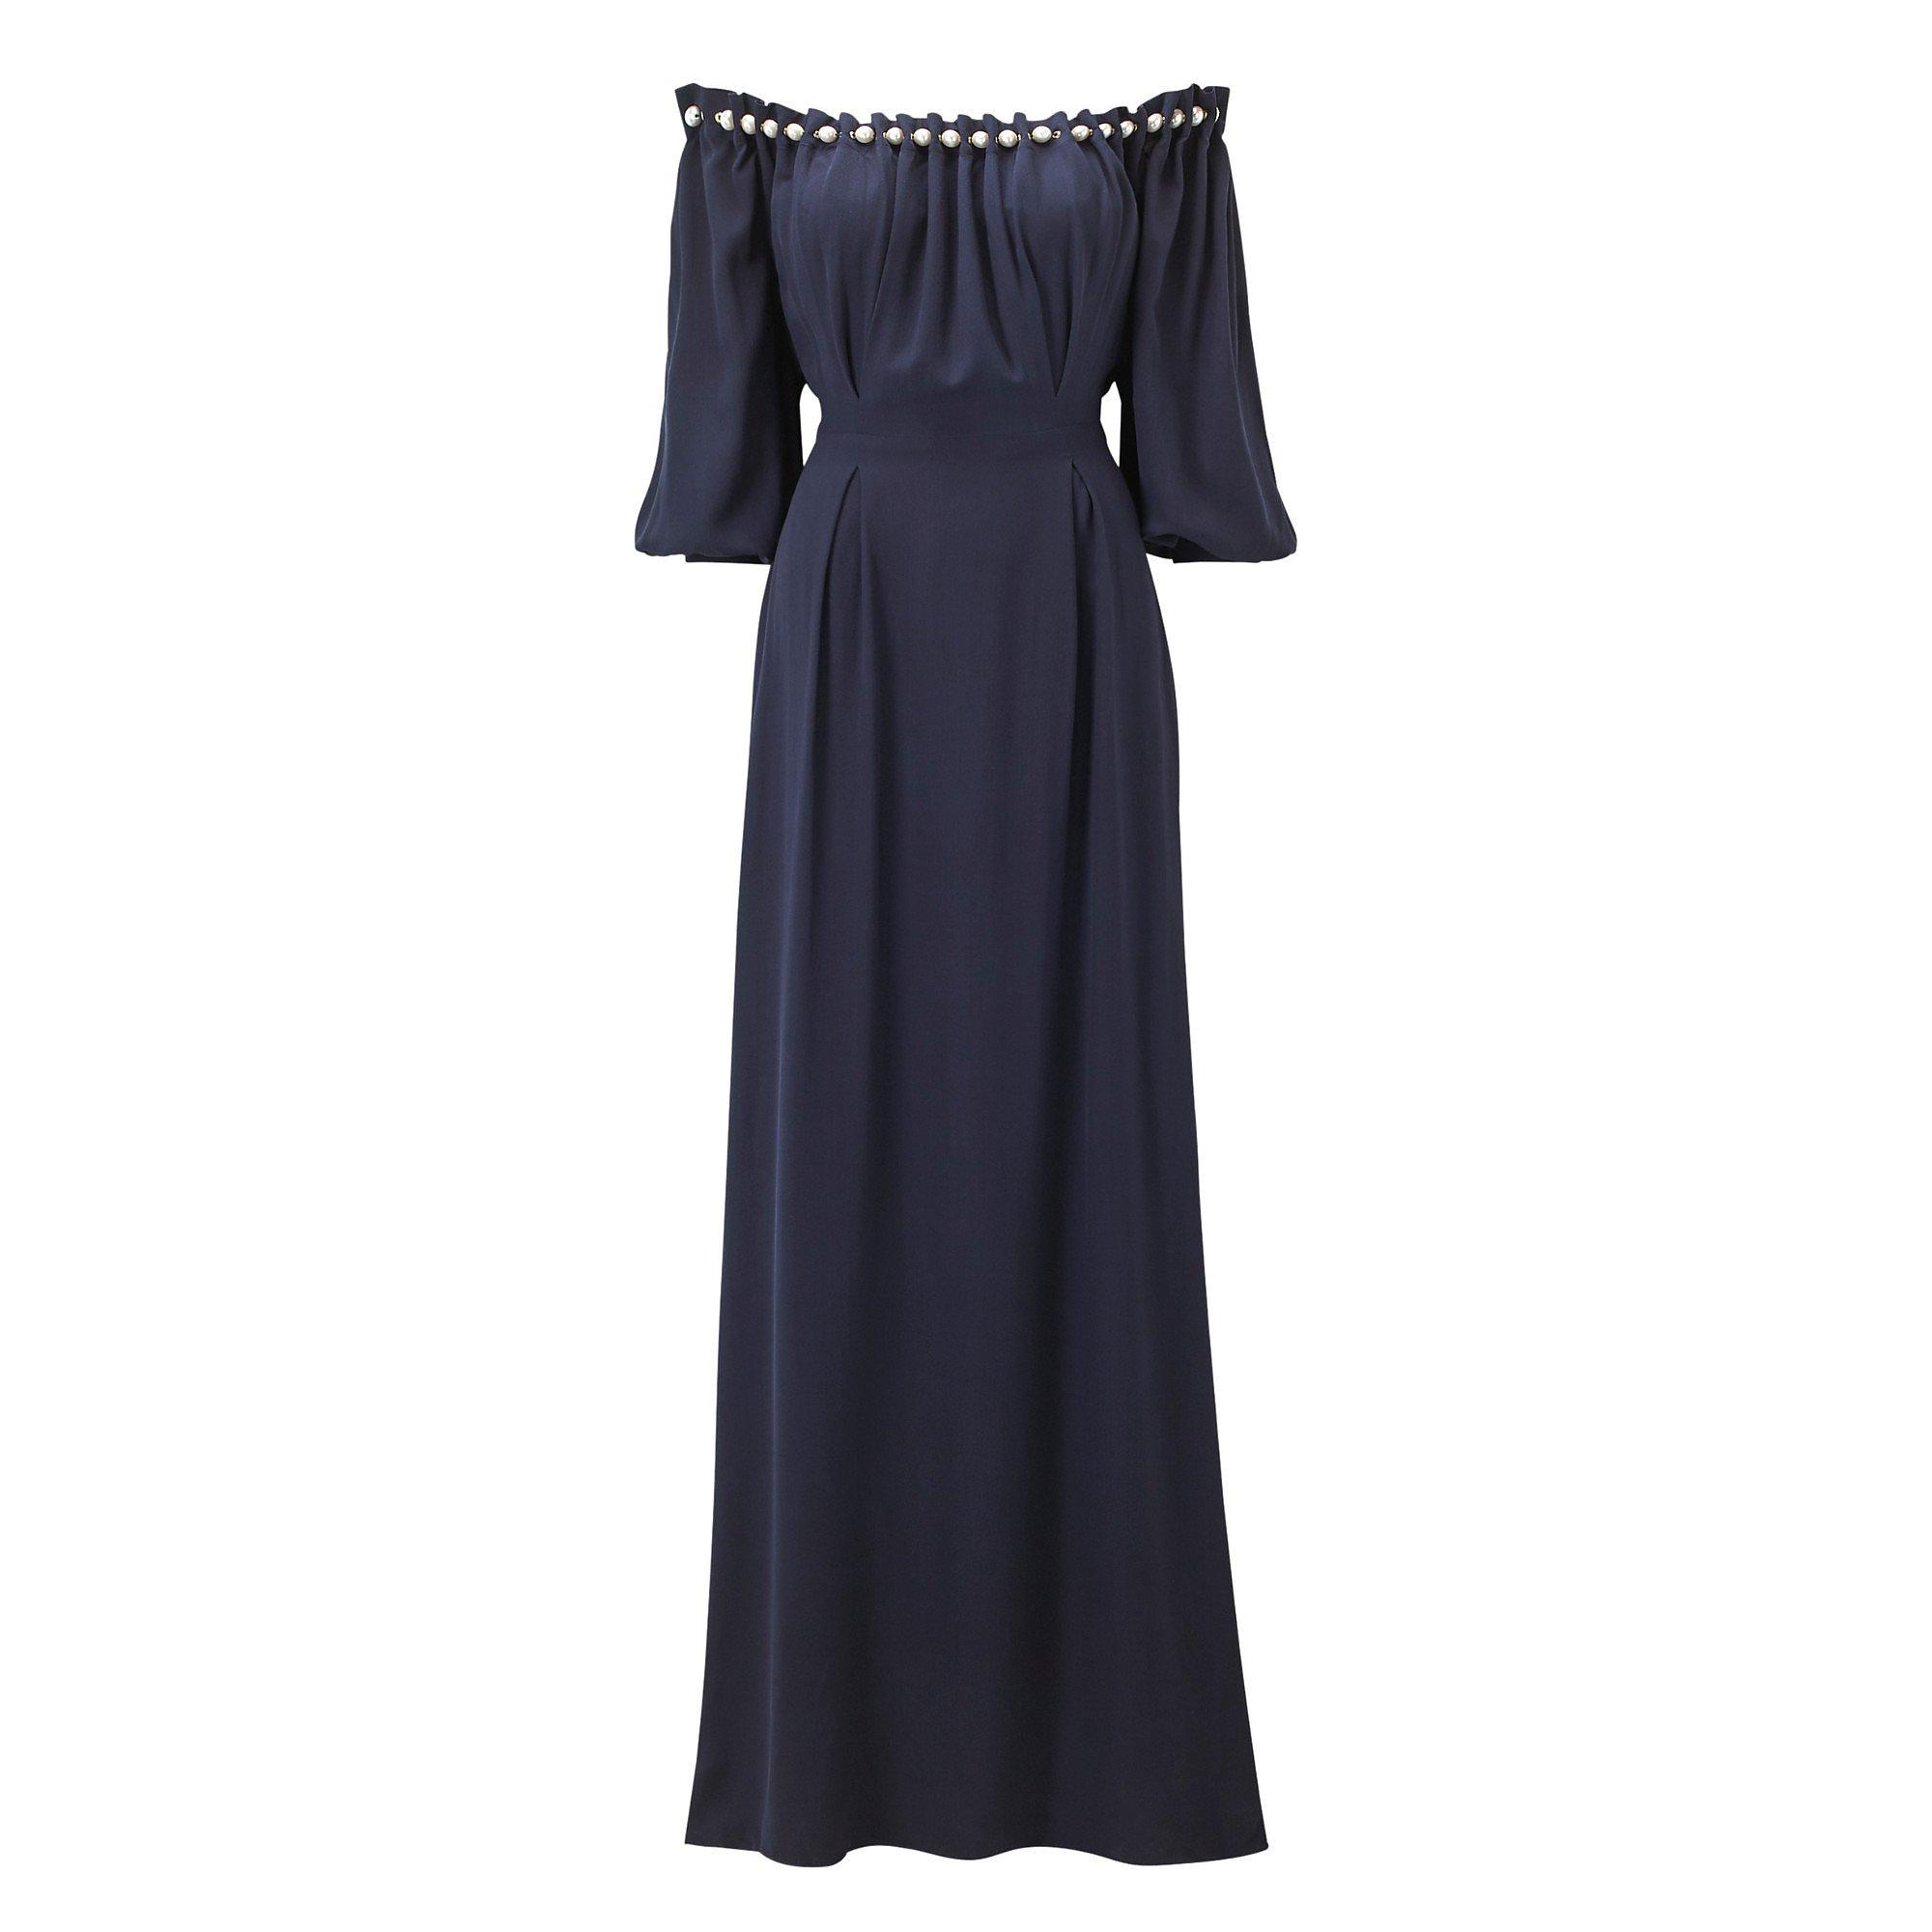 Mother of Pearl Bertha Dress